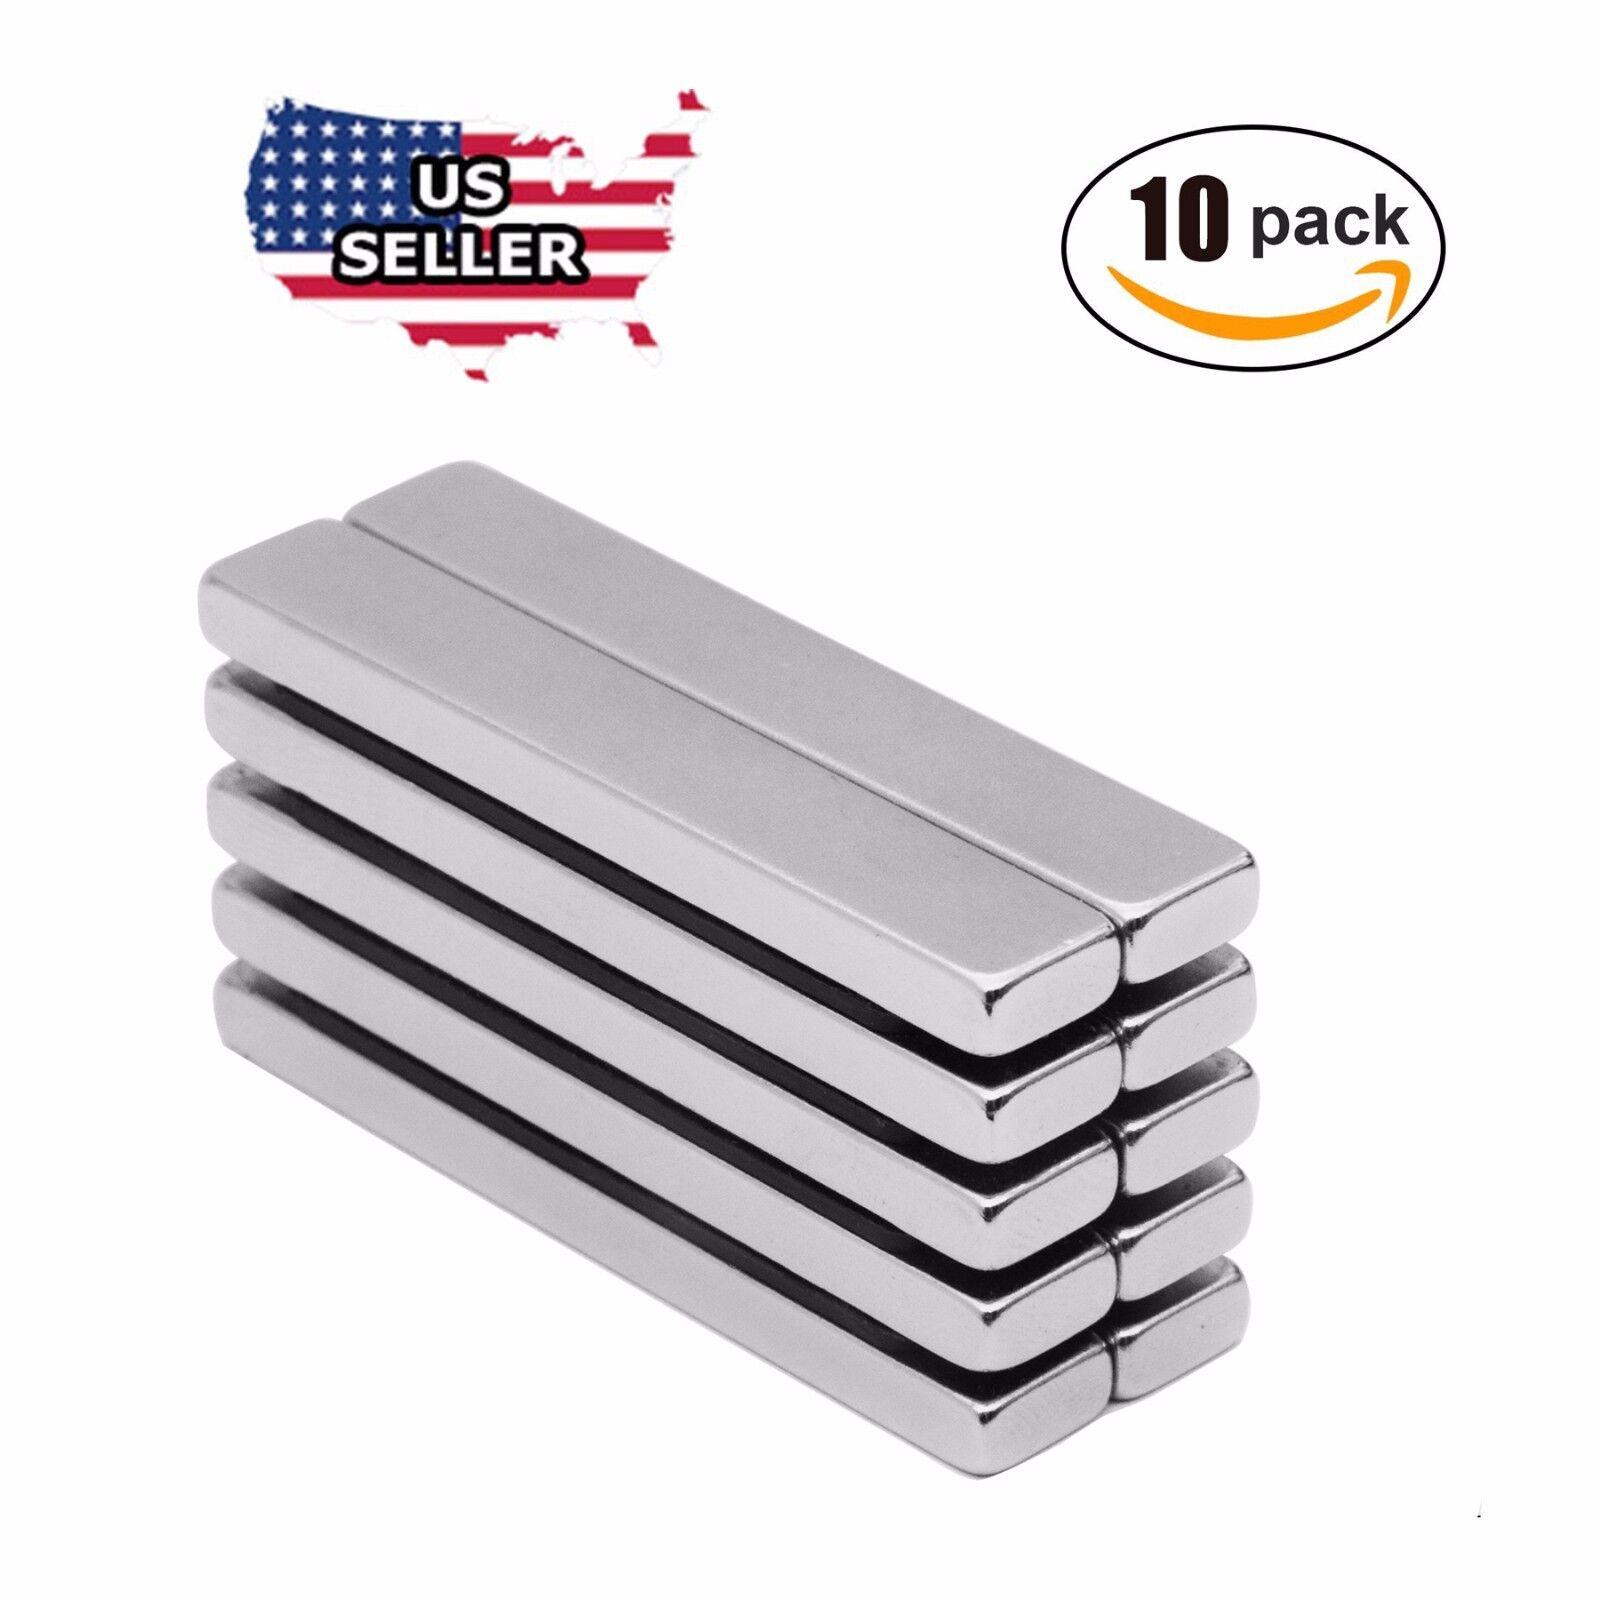 10x N52 Big Block Bar Fridge 60 x10 x 3mm Magnet Strong Rare Earth Neodymium US Business & Industrial